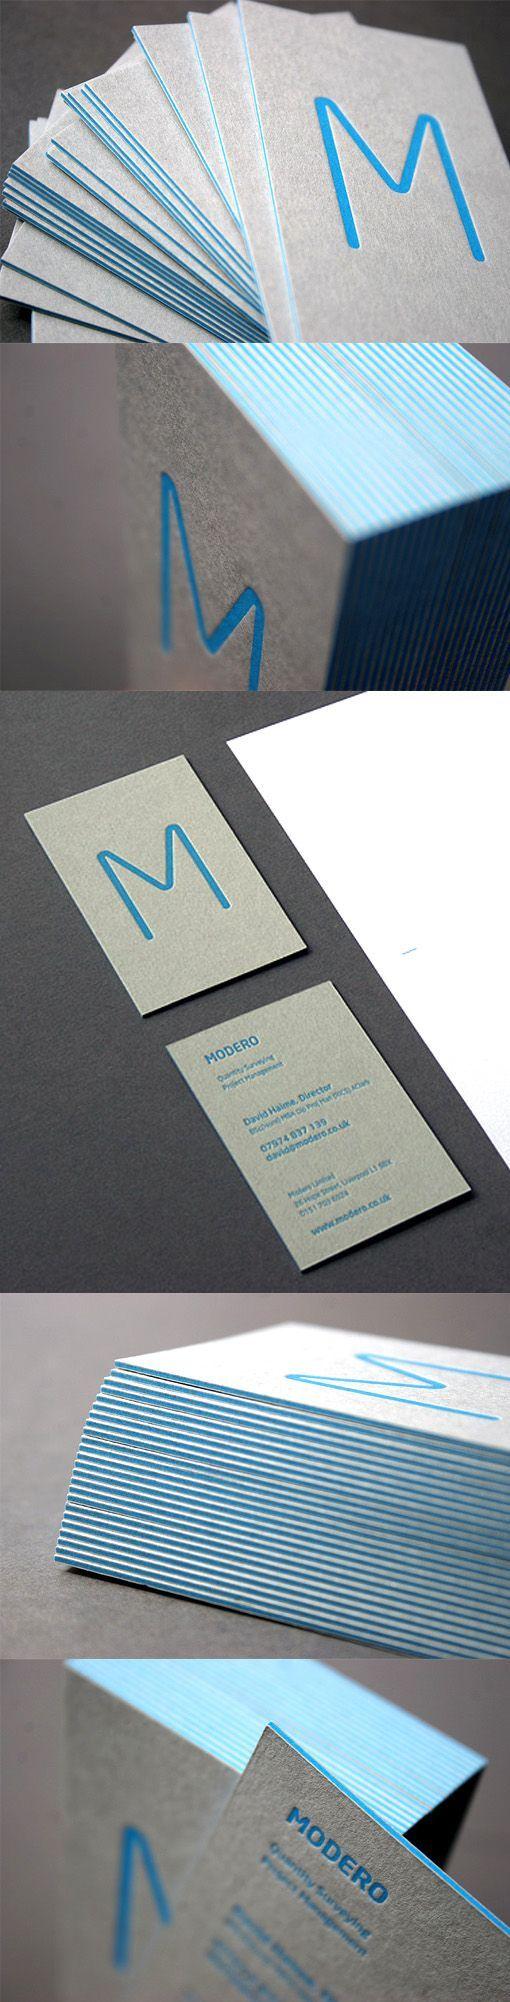 Minimalist business card letterpress printed on recycled card stock minimalist business card letterpress printed on recycled card stock reheart Choice Image